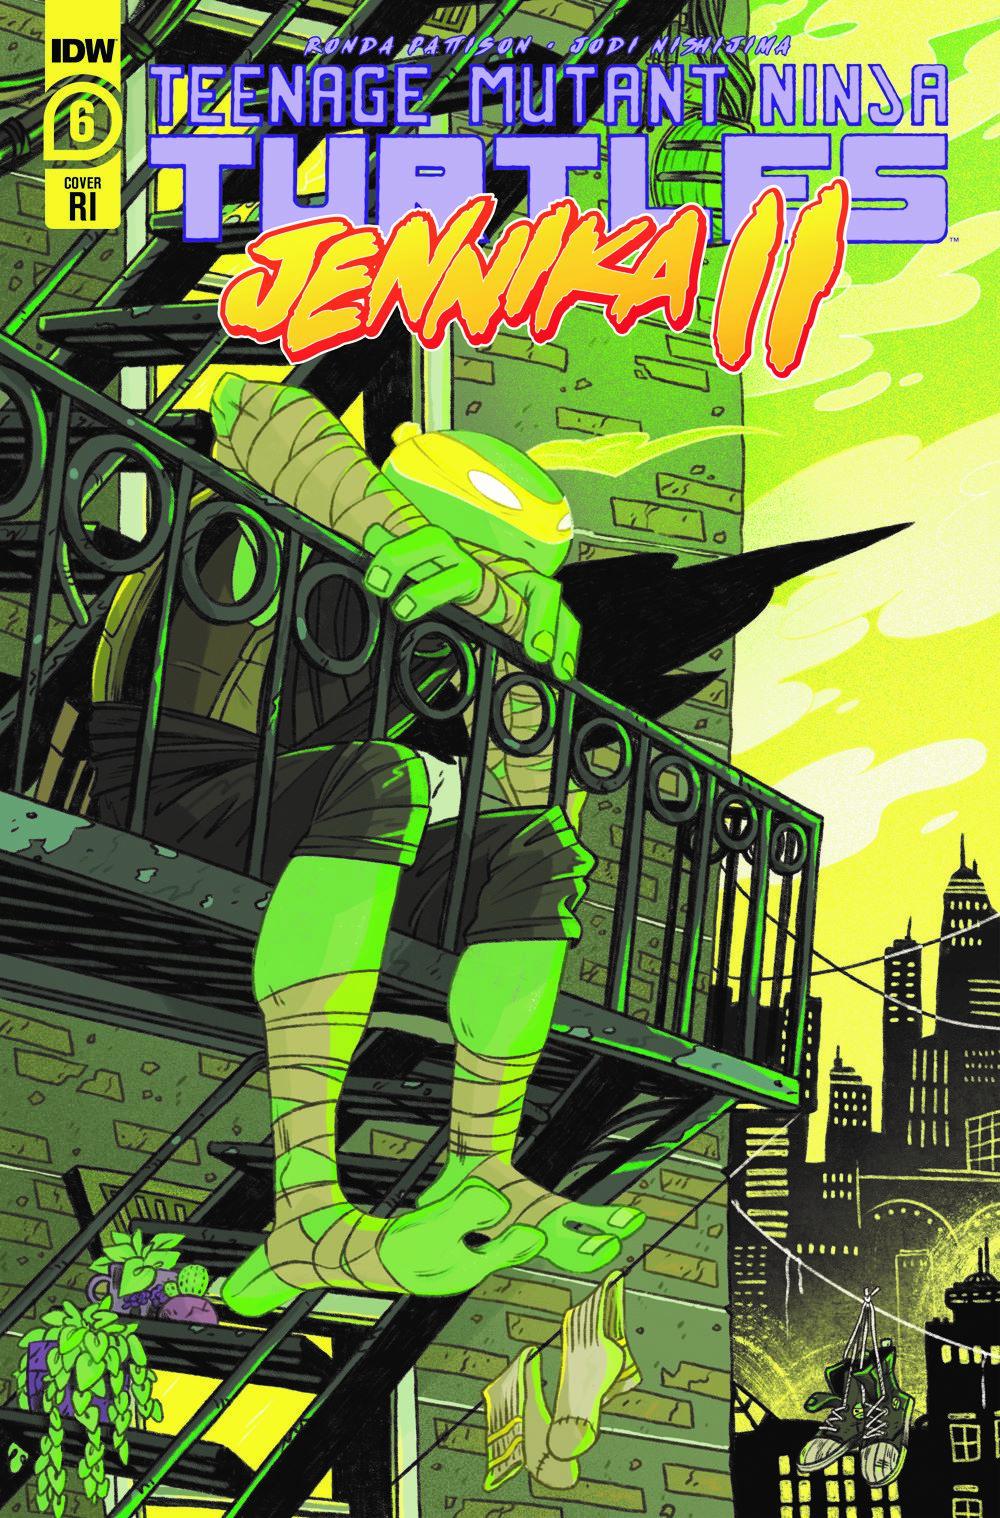 TMNT-Jennik-2 ComicList Previews: TEENAGE MUTANT NINJA TURTLES JENNIKA II #6 (OF 6)